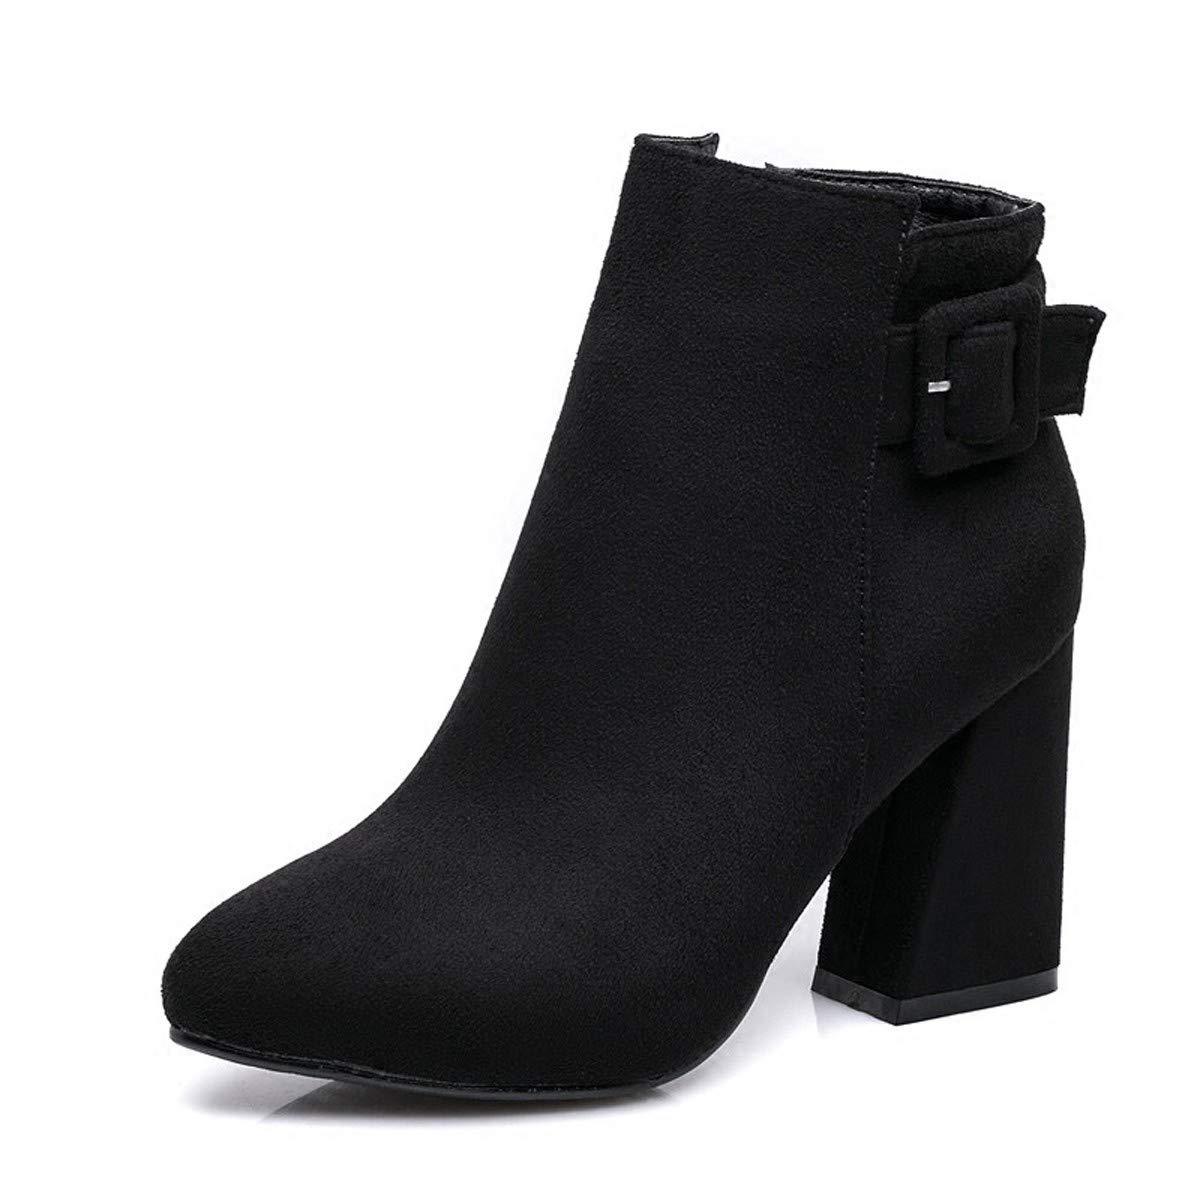 LBTSQ-Samt Spitze Martin Stiefel 8Cm Zuckerguss Temperament High Heels Dicke Schuhe Kurze Stiefel.